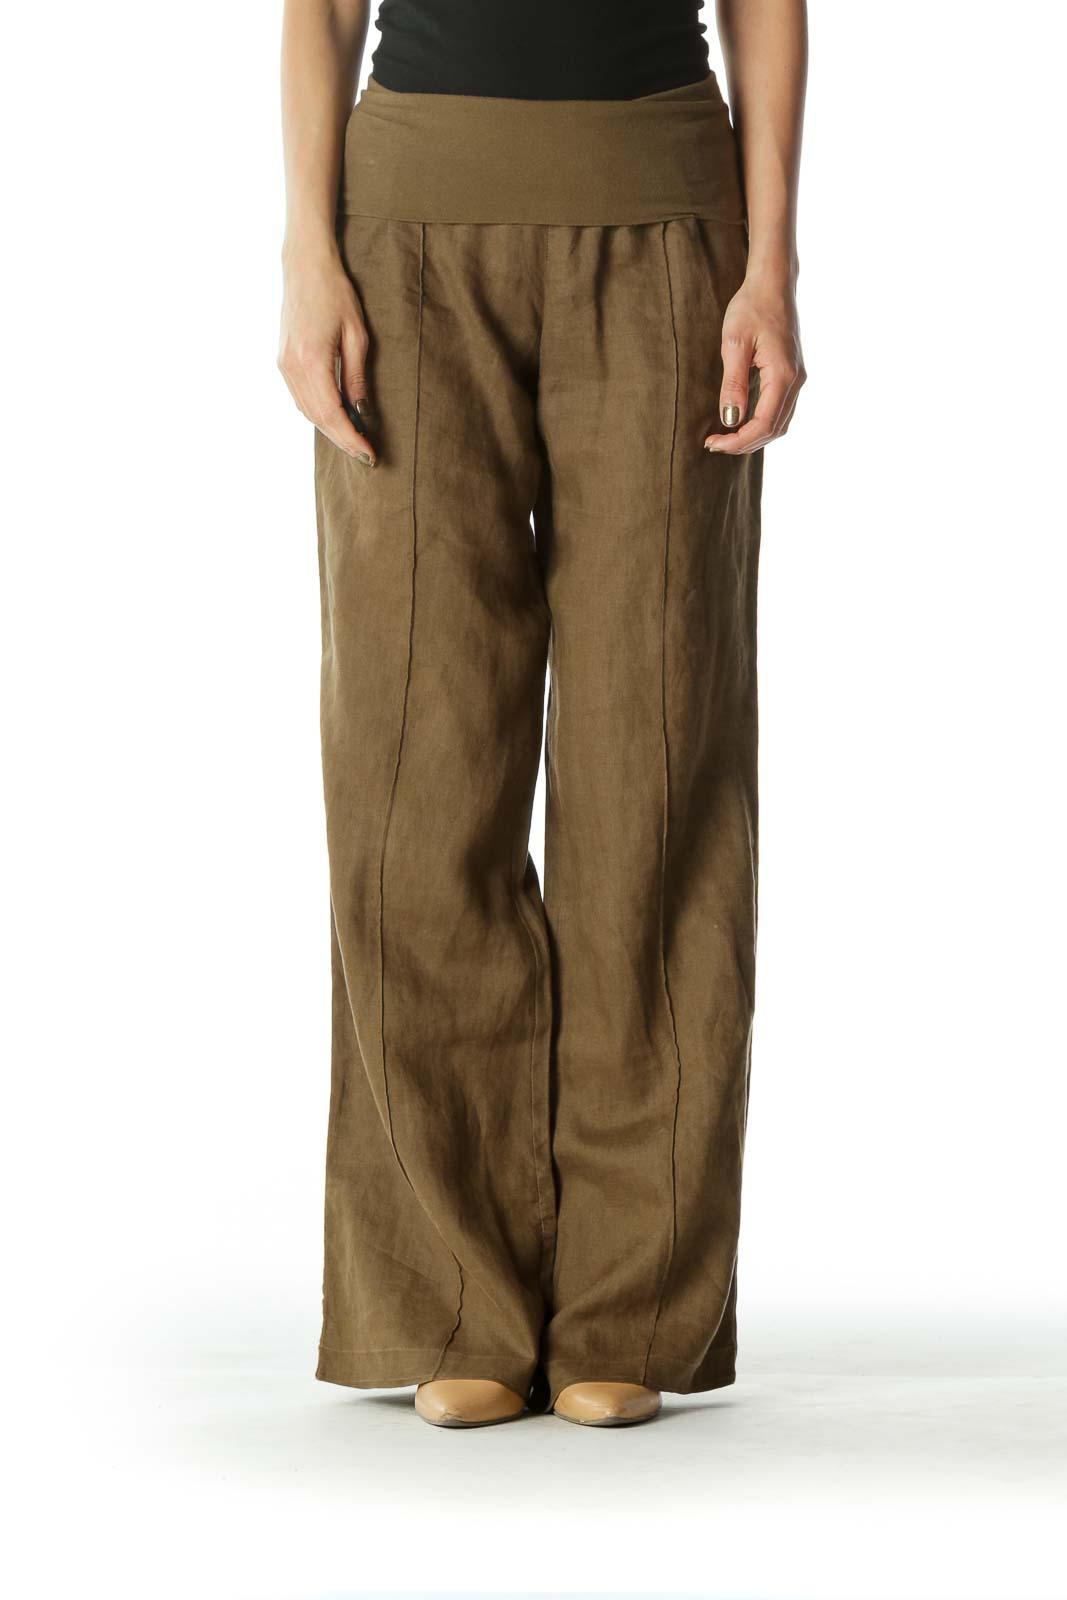 Green Gaucho Pants